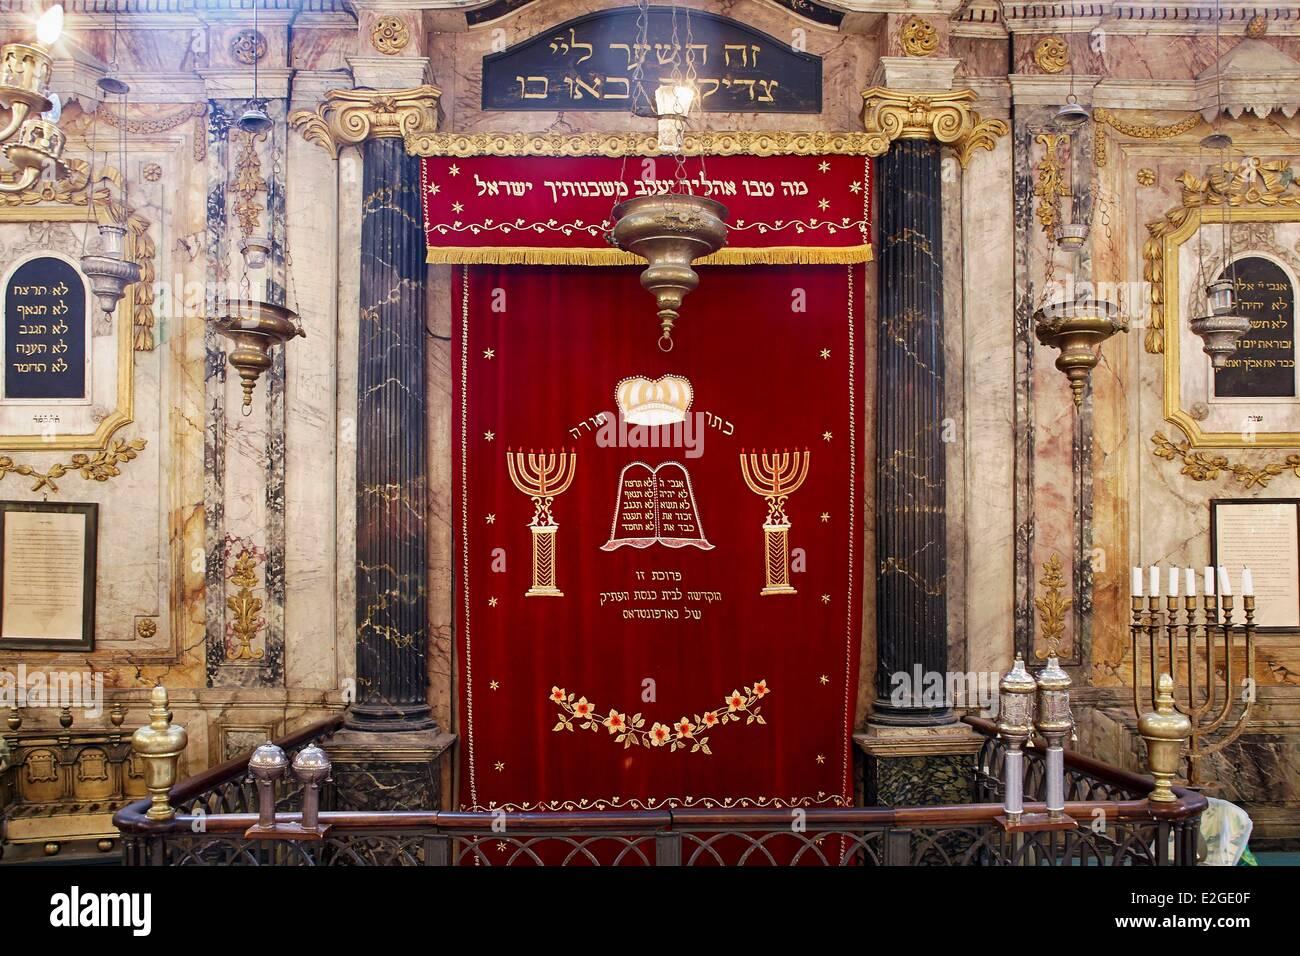 France Vaucluse CaRM-Eentras Synagogue prayer hall - Stock Image